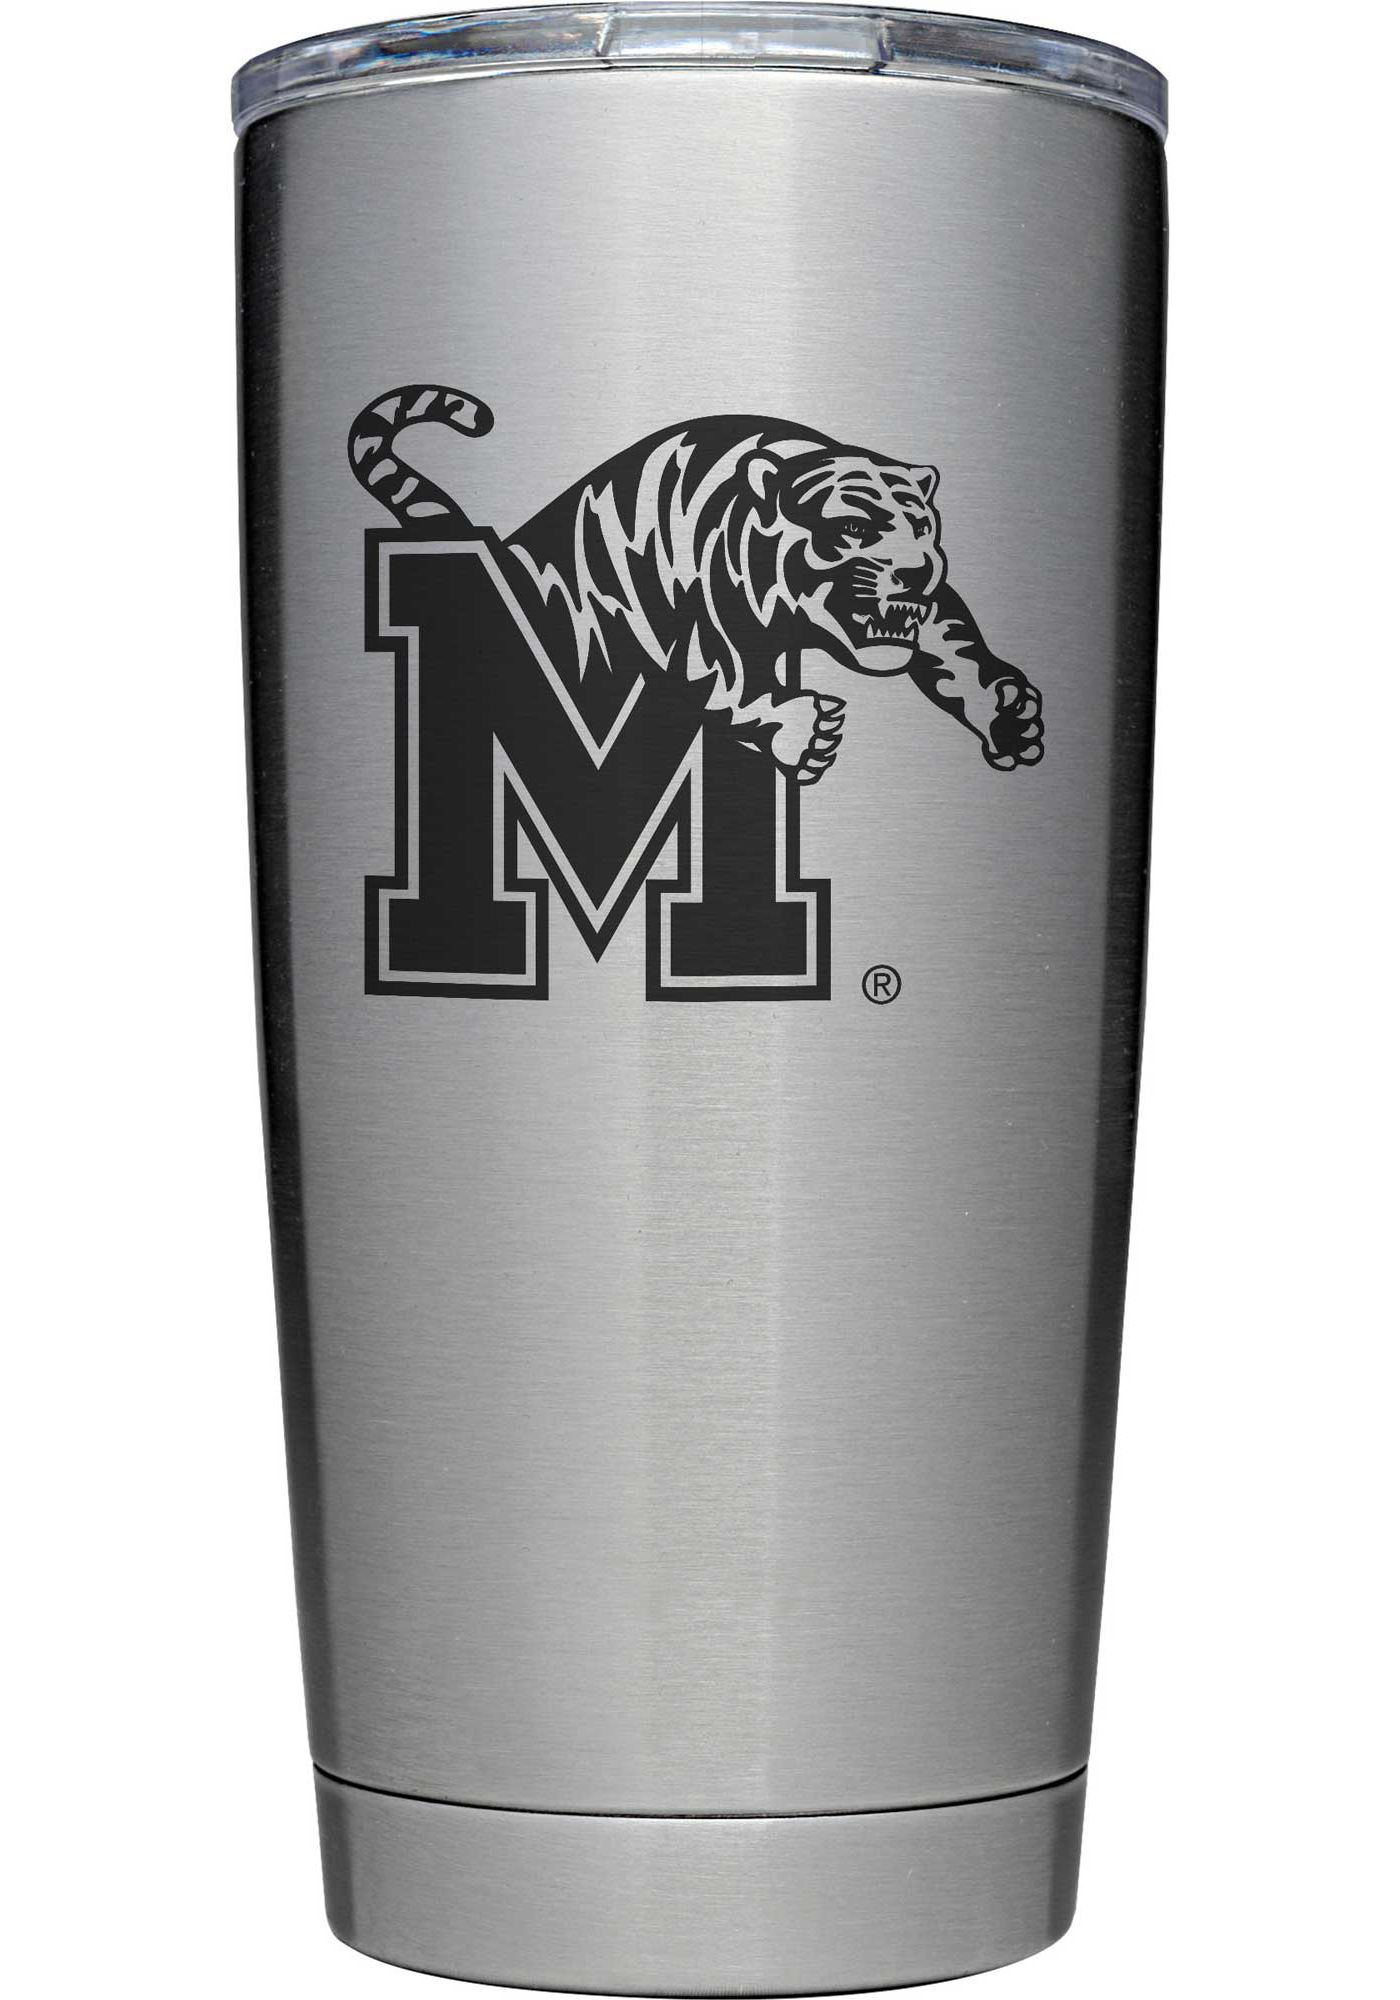 YETI Memphis Tigers 20 oz. Rambler Tumbler with MagSlider Lid